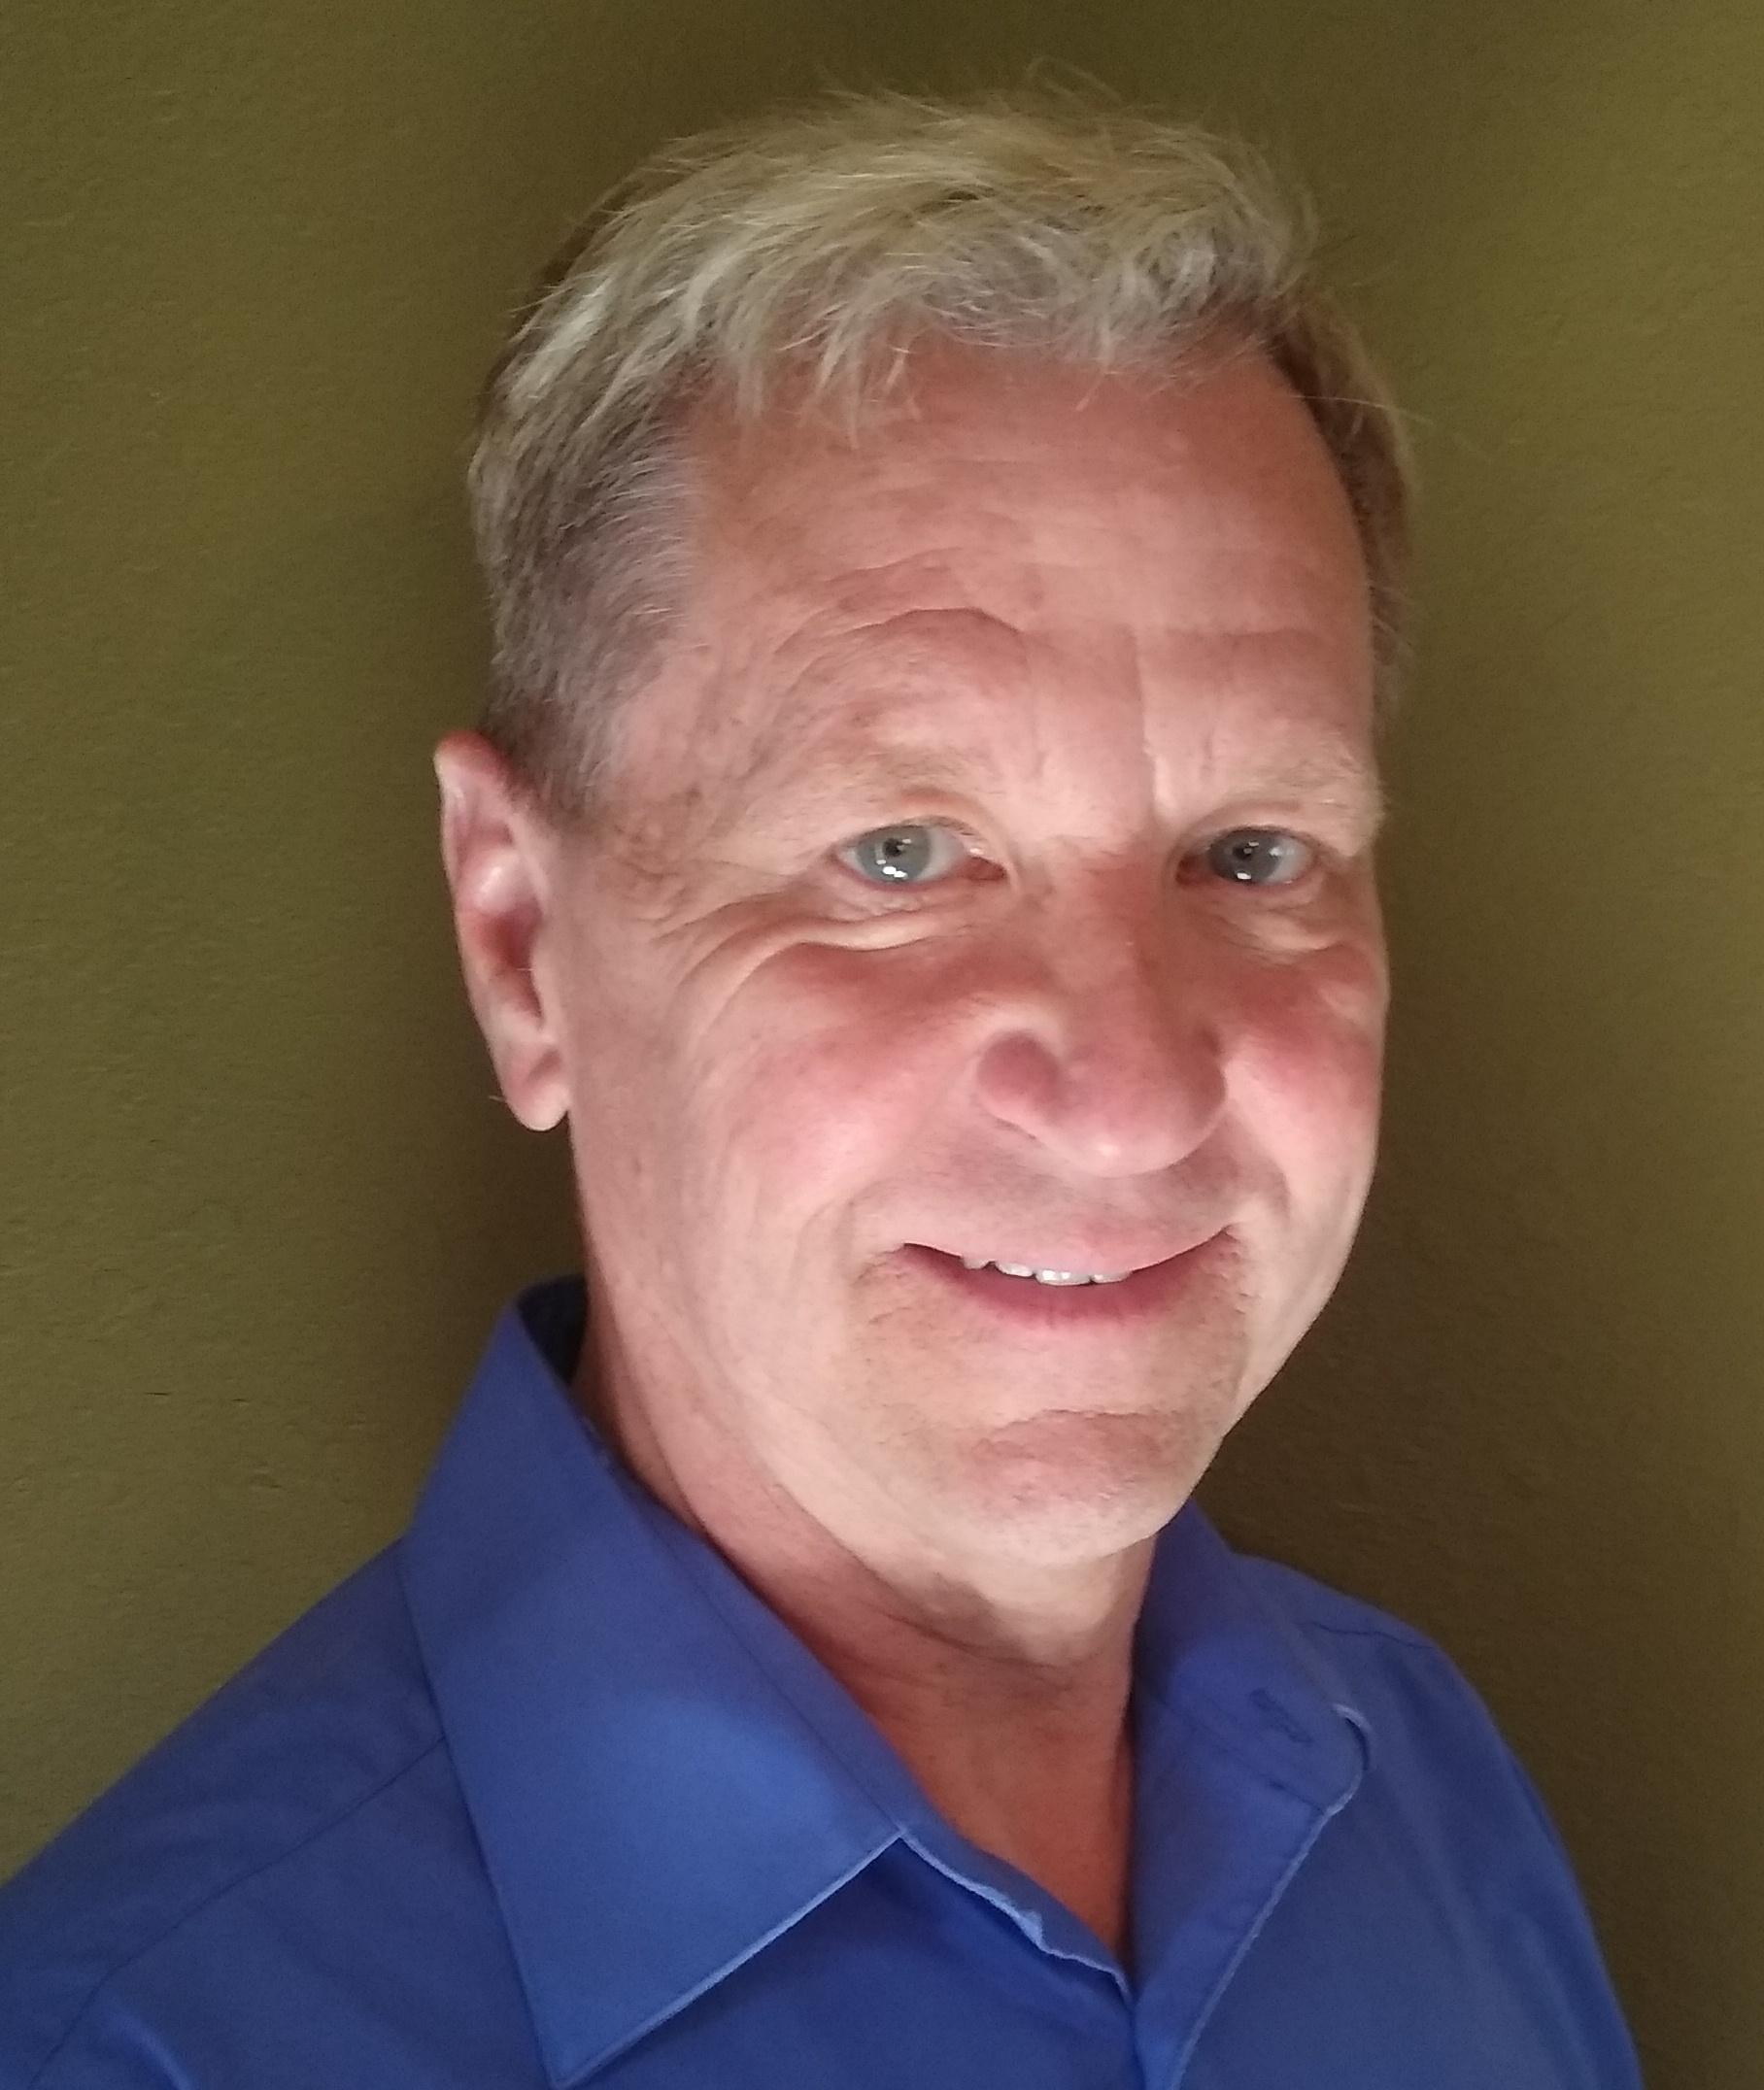 Meet Wardell of 'Sordid Lives': Ken Snart